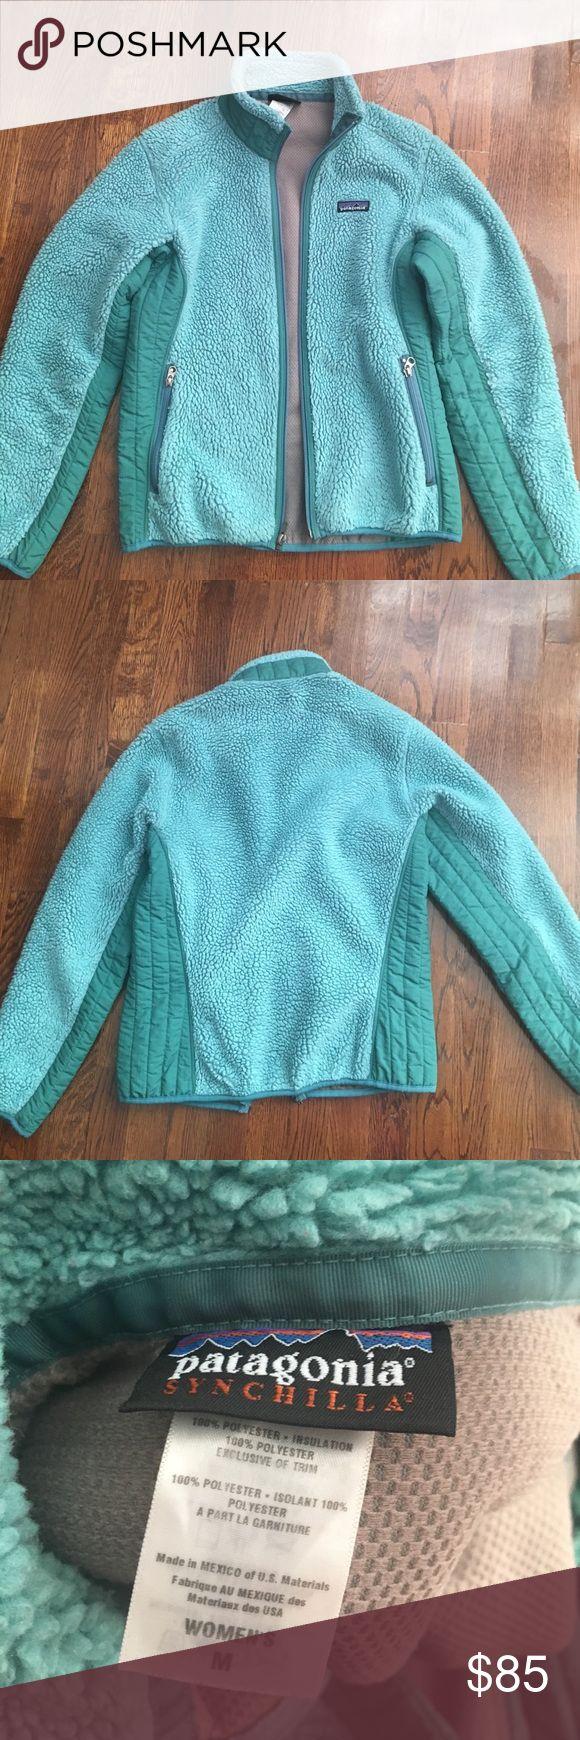 Patagonia Synchilla jacket M Women's M Patagonia Synchilla jacket. EUC. Smoke and pet free home. Pretty shade of green. Fits more like a small. Patagonia Jackets & Coats Utility Jackets